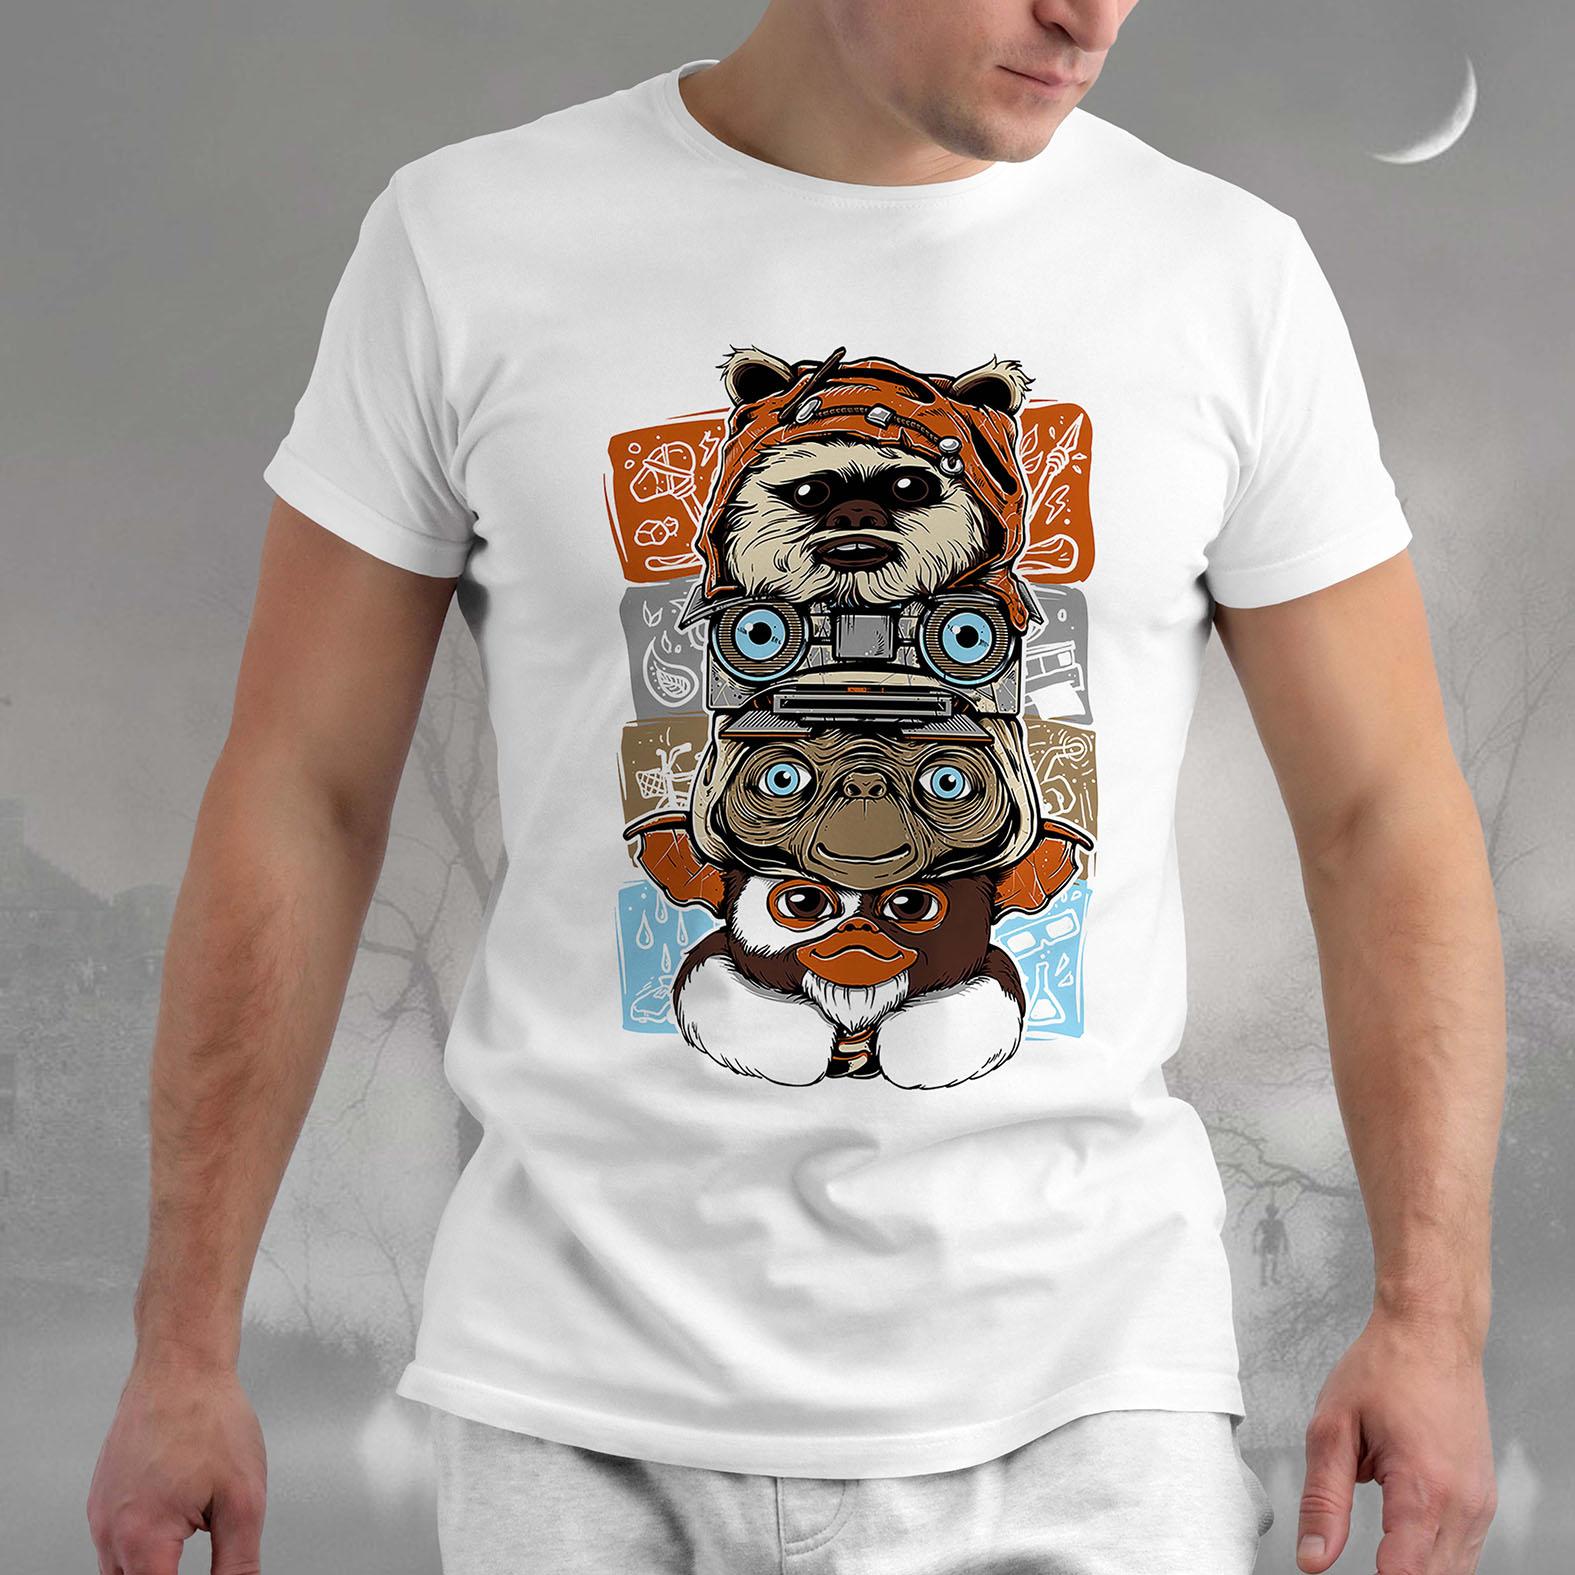 Camiseta Masculina Unissex Ewoks Johnny Five Et Extraterrestre Mogwai Gremlins Monsters Anos 80s Horror (Branca) - EV